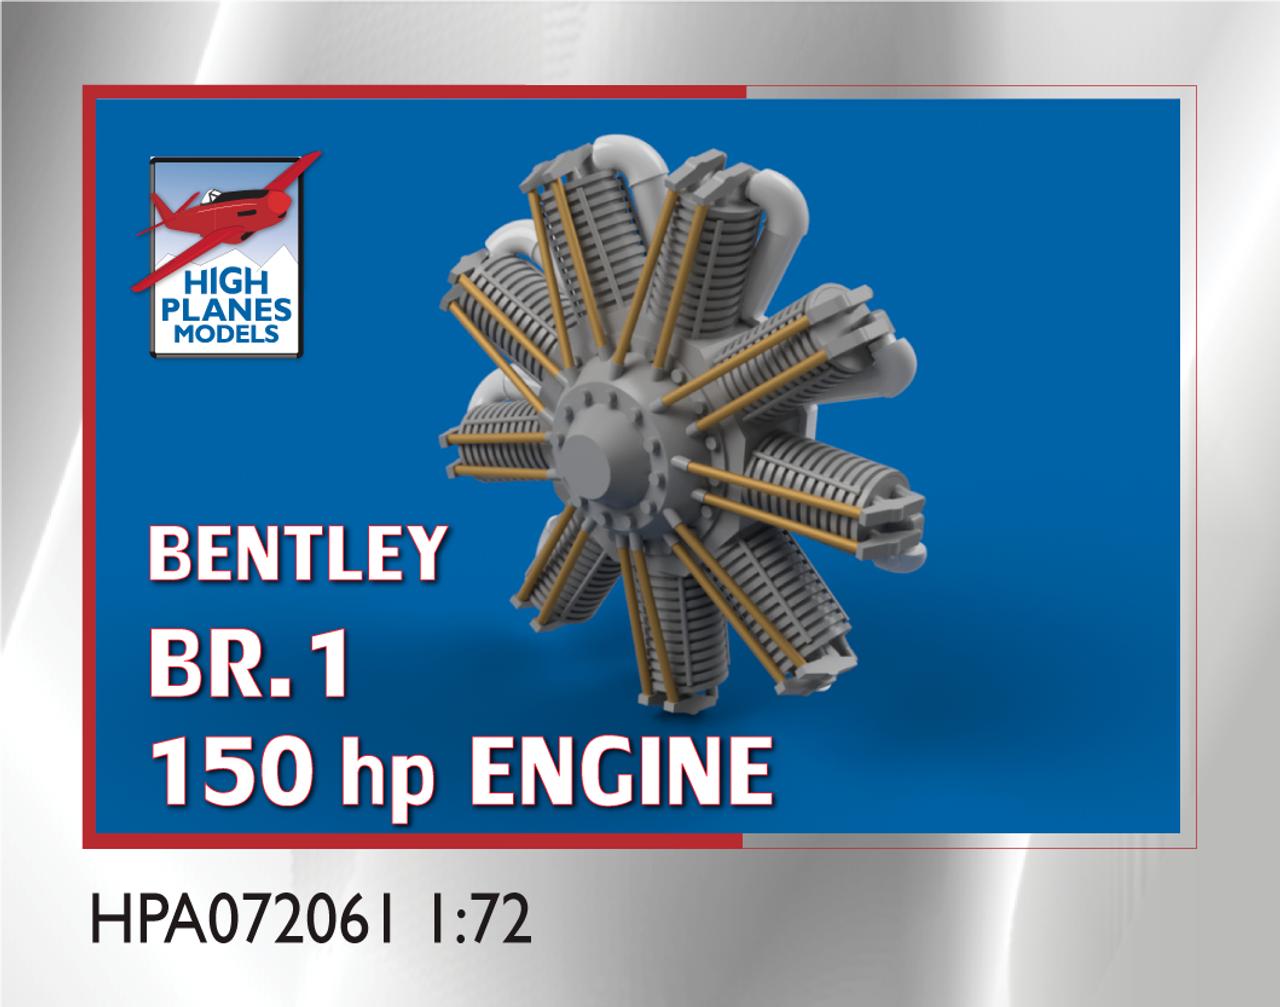 High Planes Bentley BR.1 engine (Accessories 1:72)